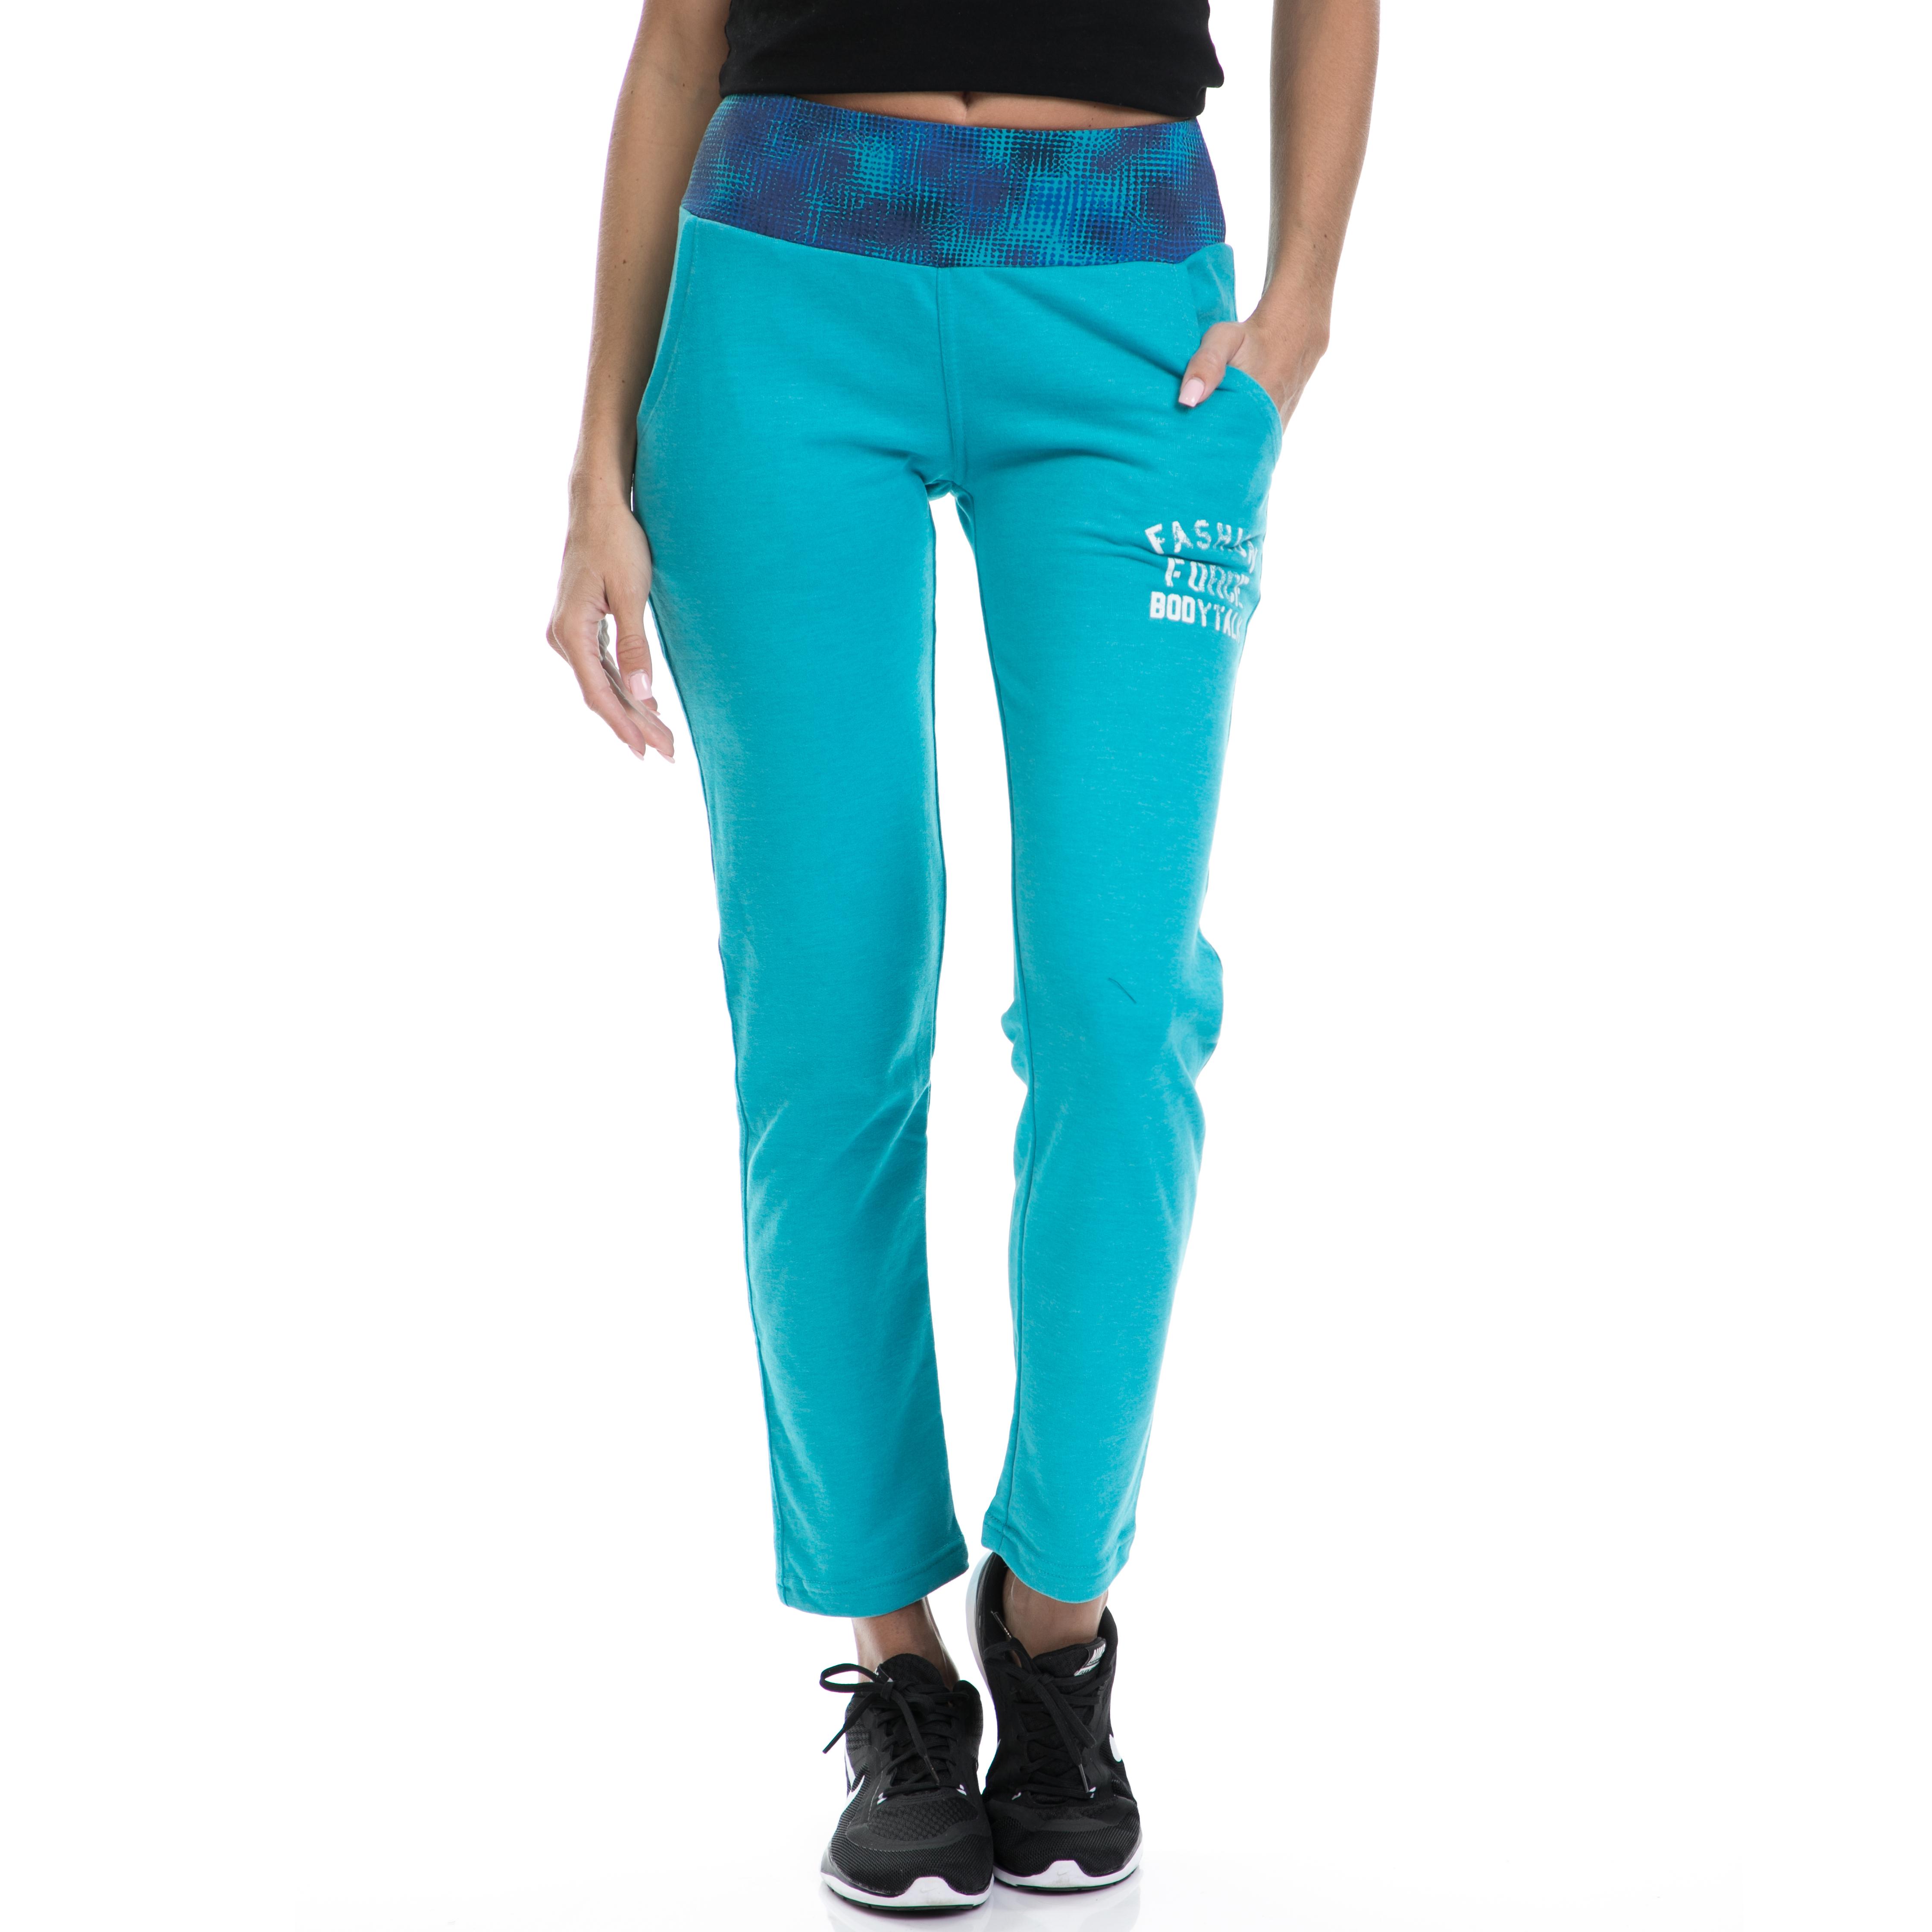 BODYTALK - Γυναικεία φόρμα BODYTALK μπλε γυναικεία ρούχα αθλητικά φόρμες